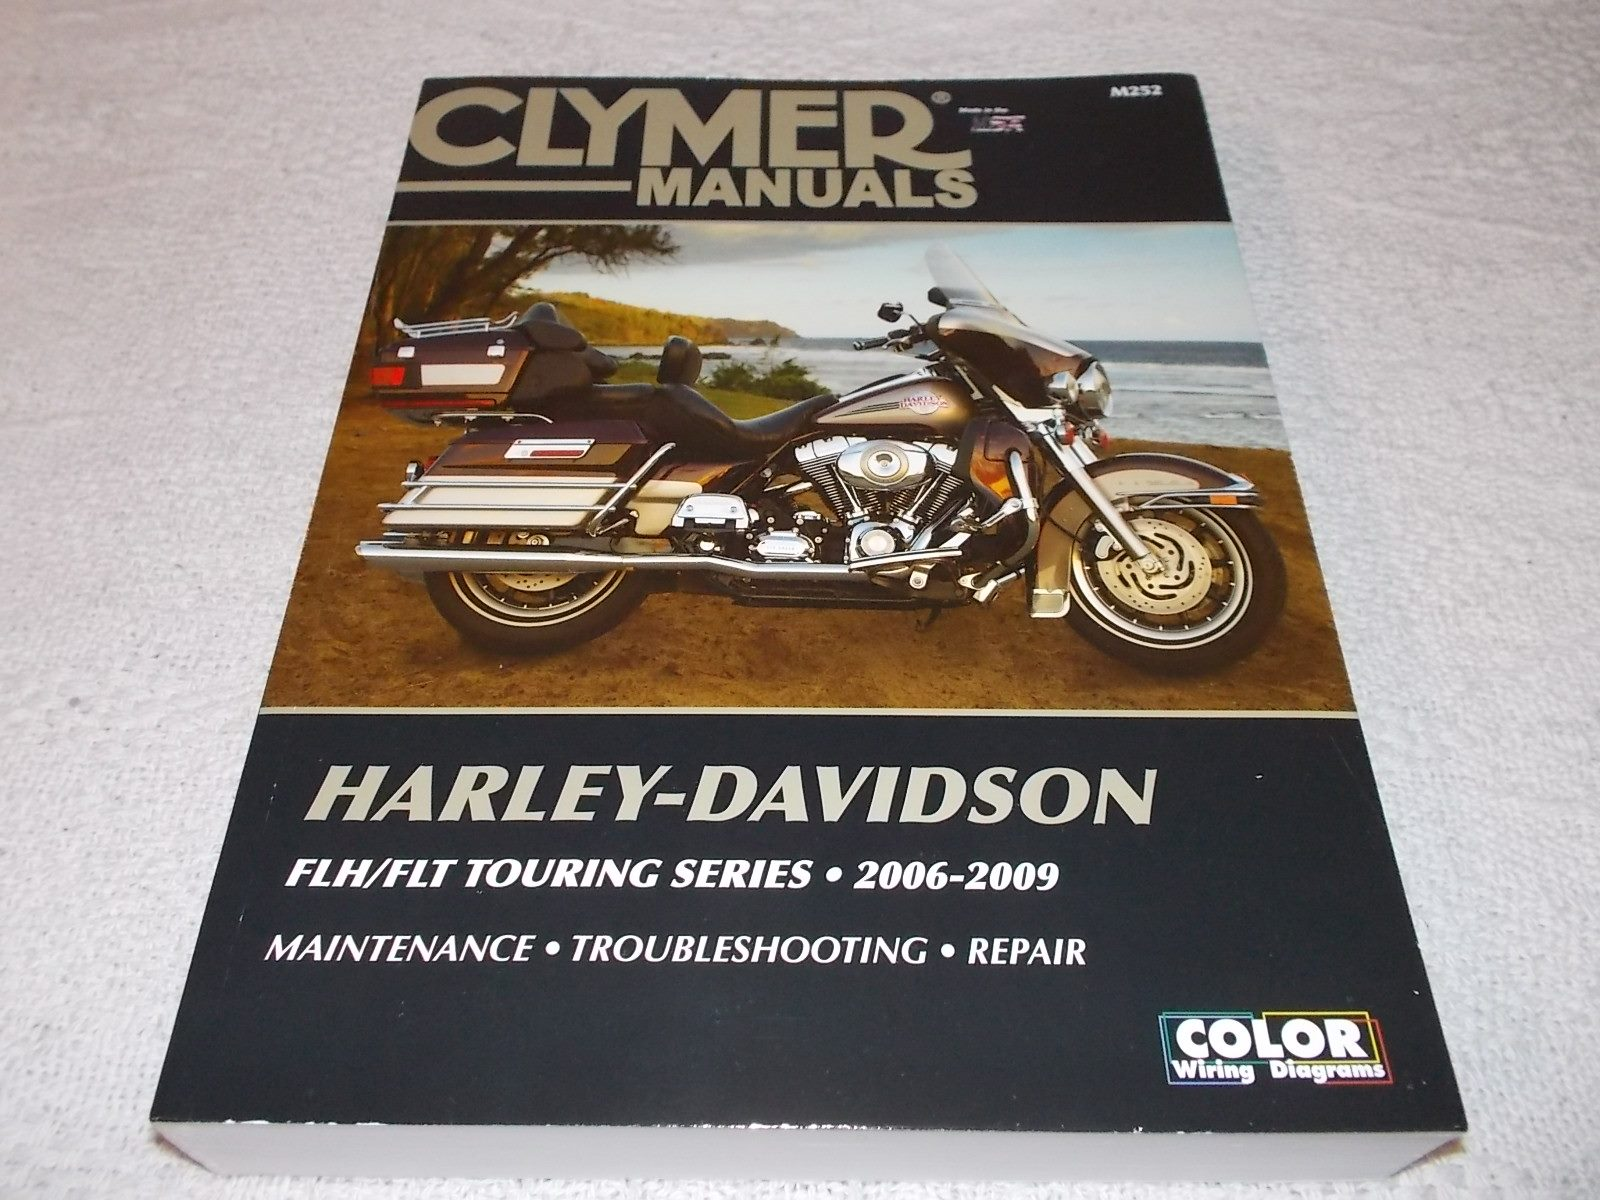 Harley Davidson FLH/FLT Touring Series 06-09 Clymer manual ... on